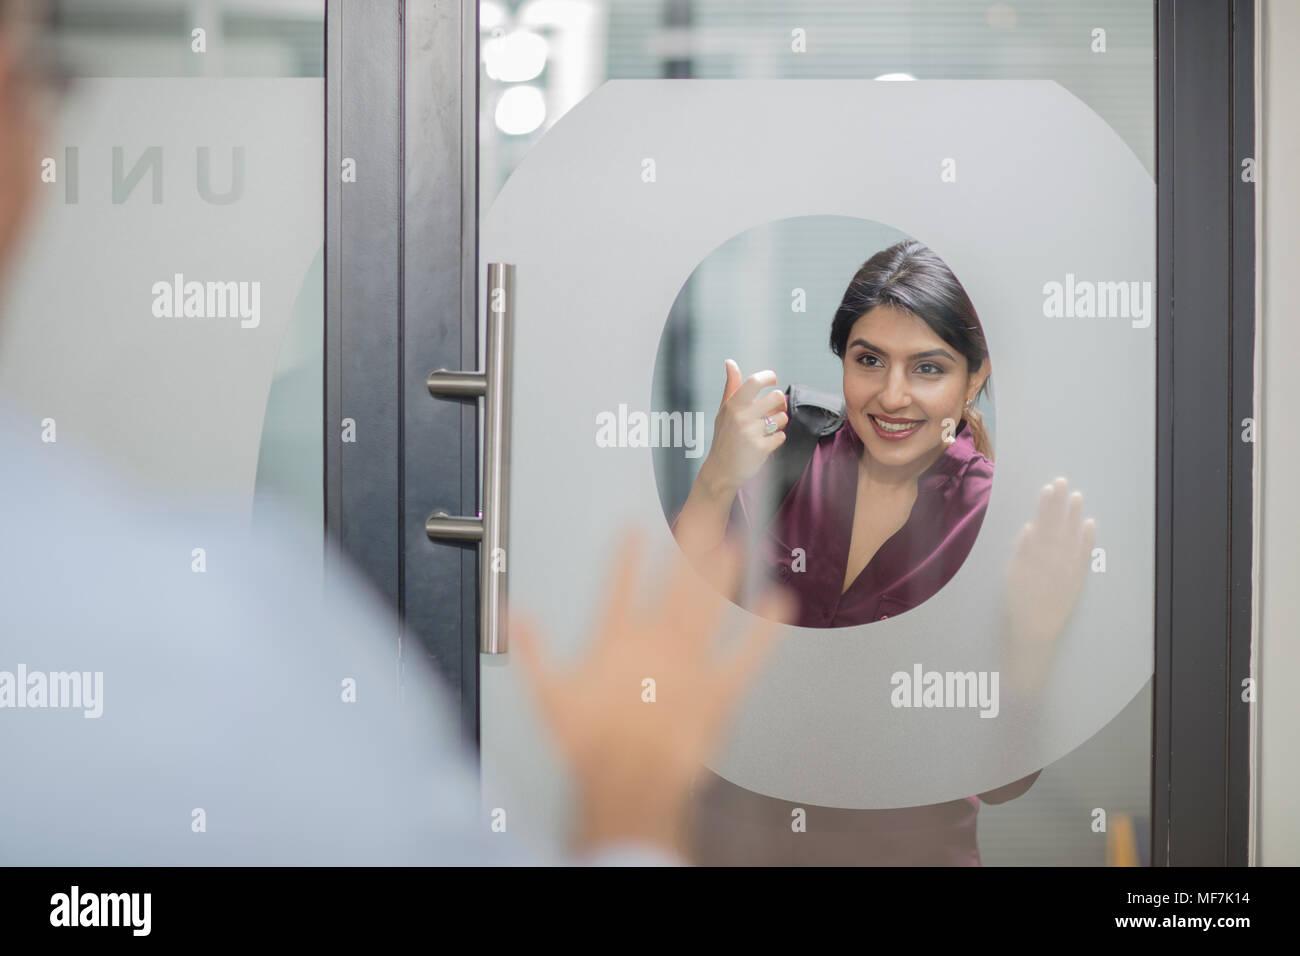 Businesswoman knocking on glass door - Stock Image